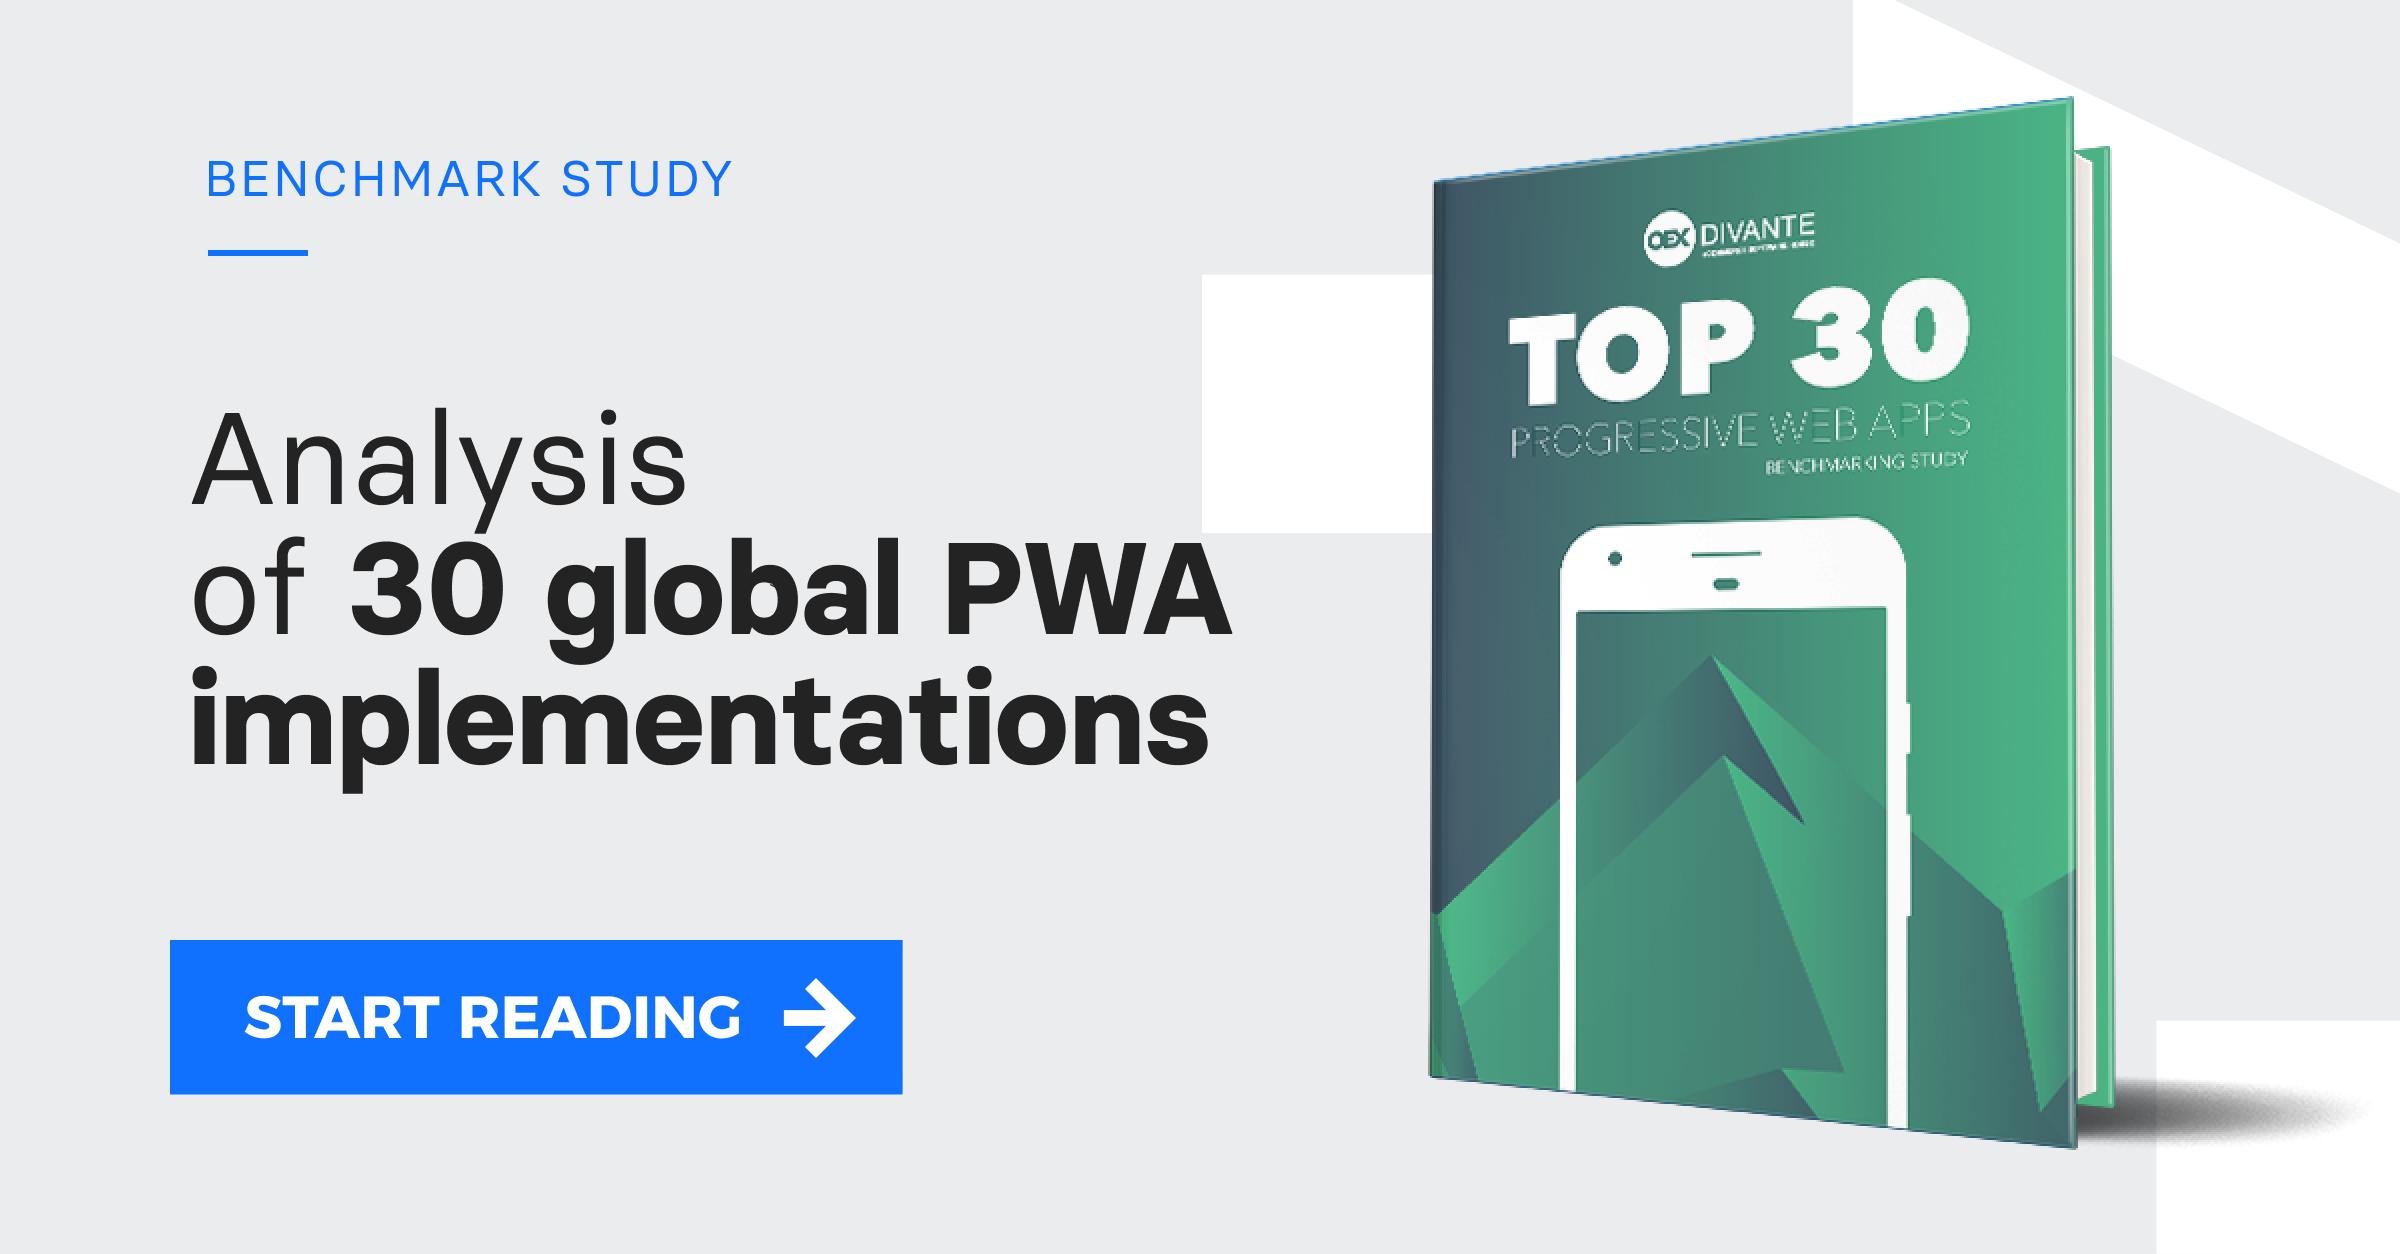 TOP 30 PWAs - Download FREE Benchmarking Study